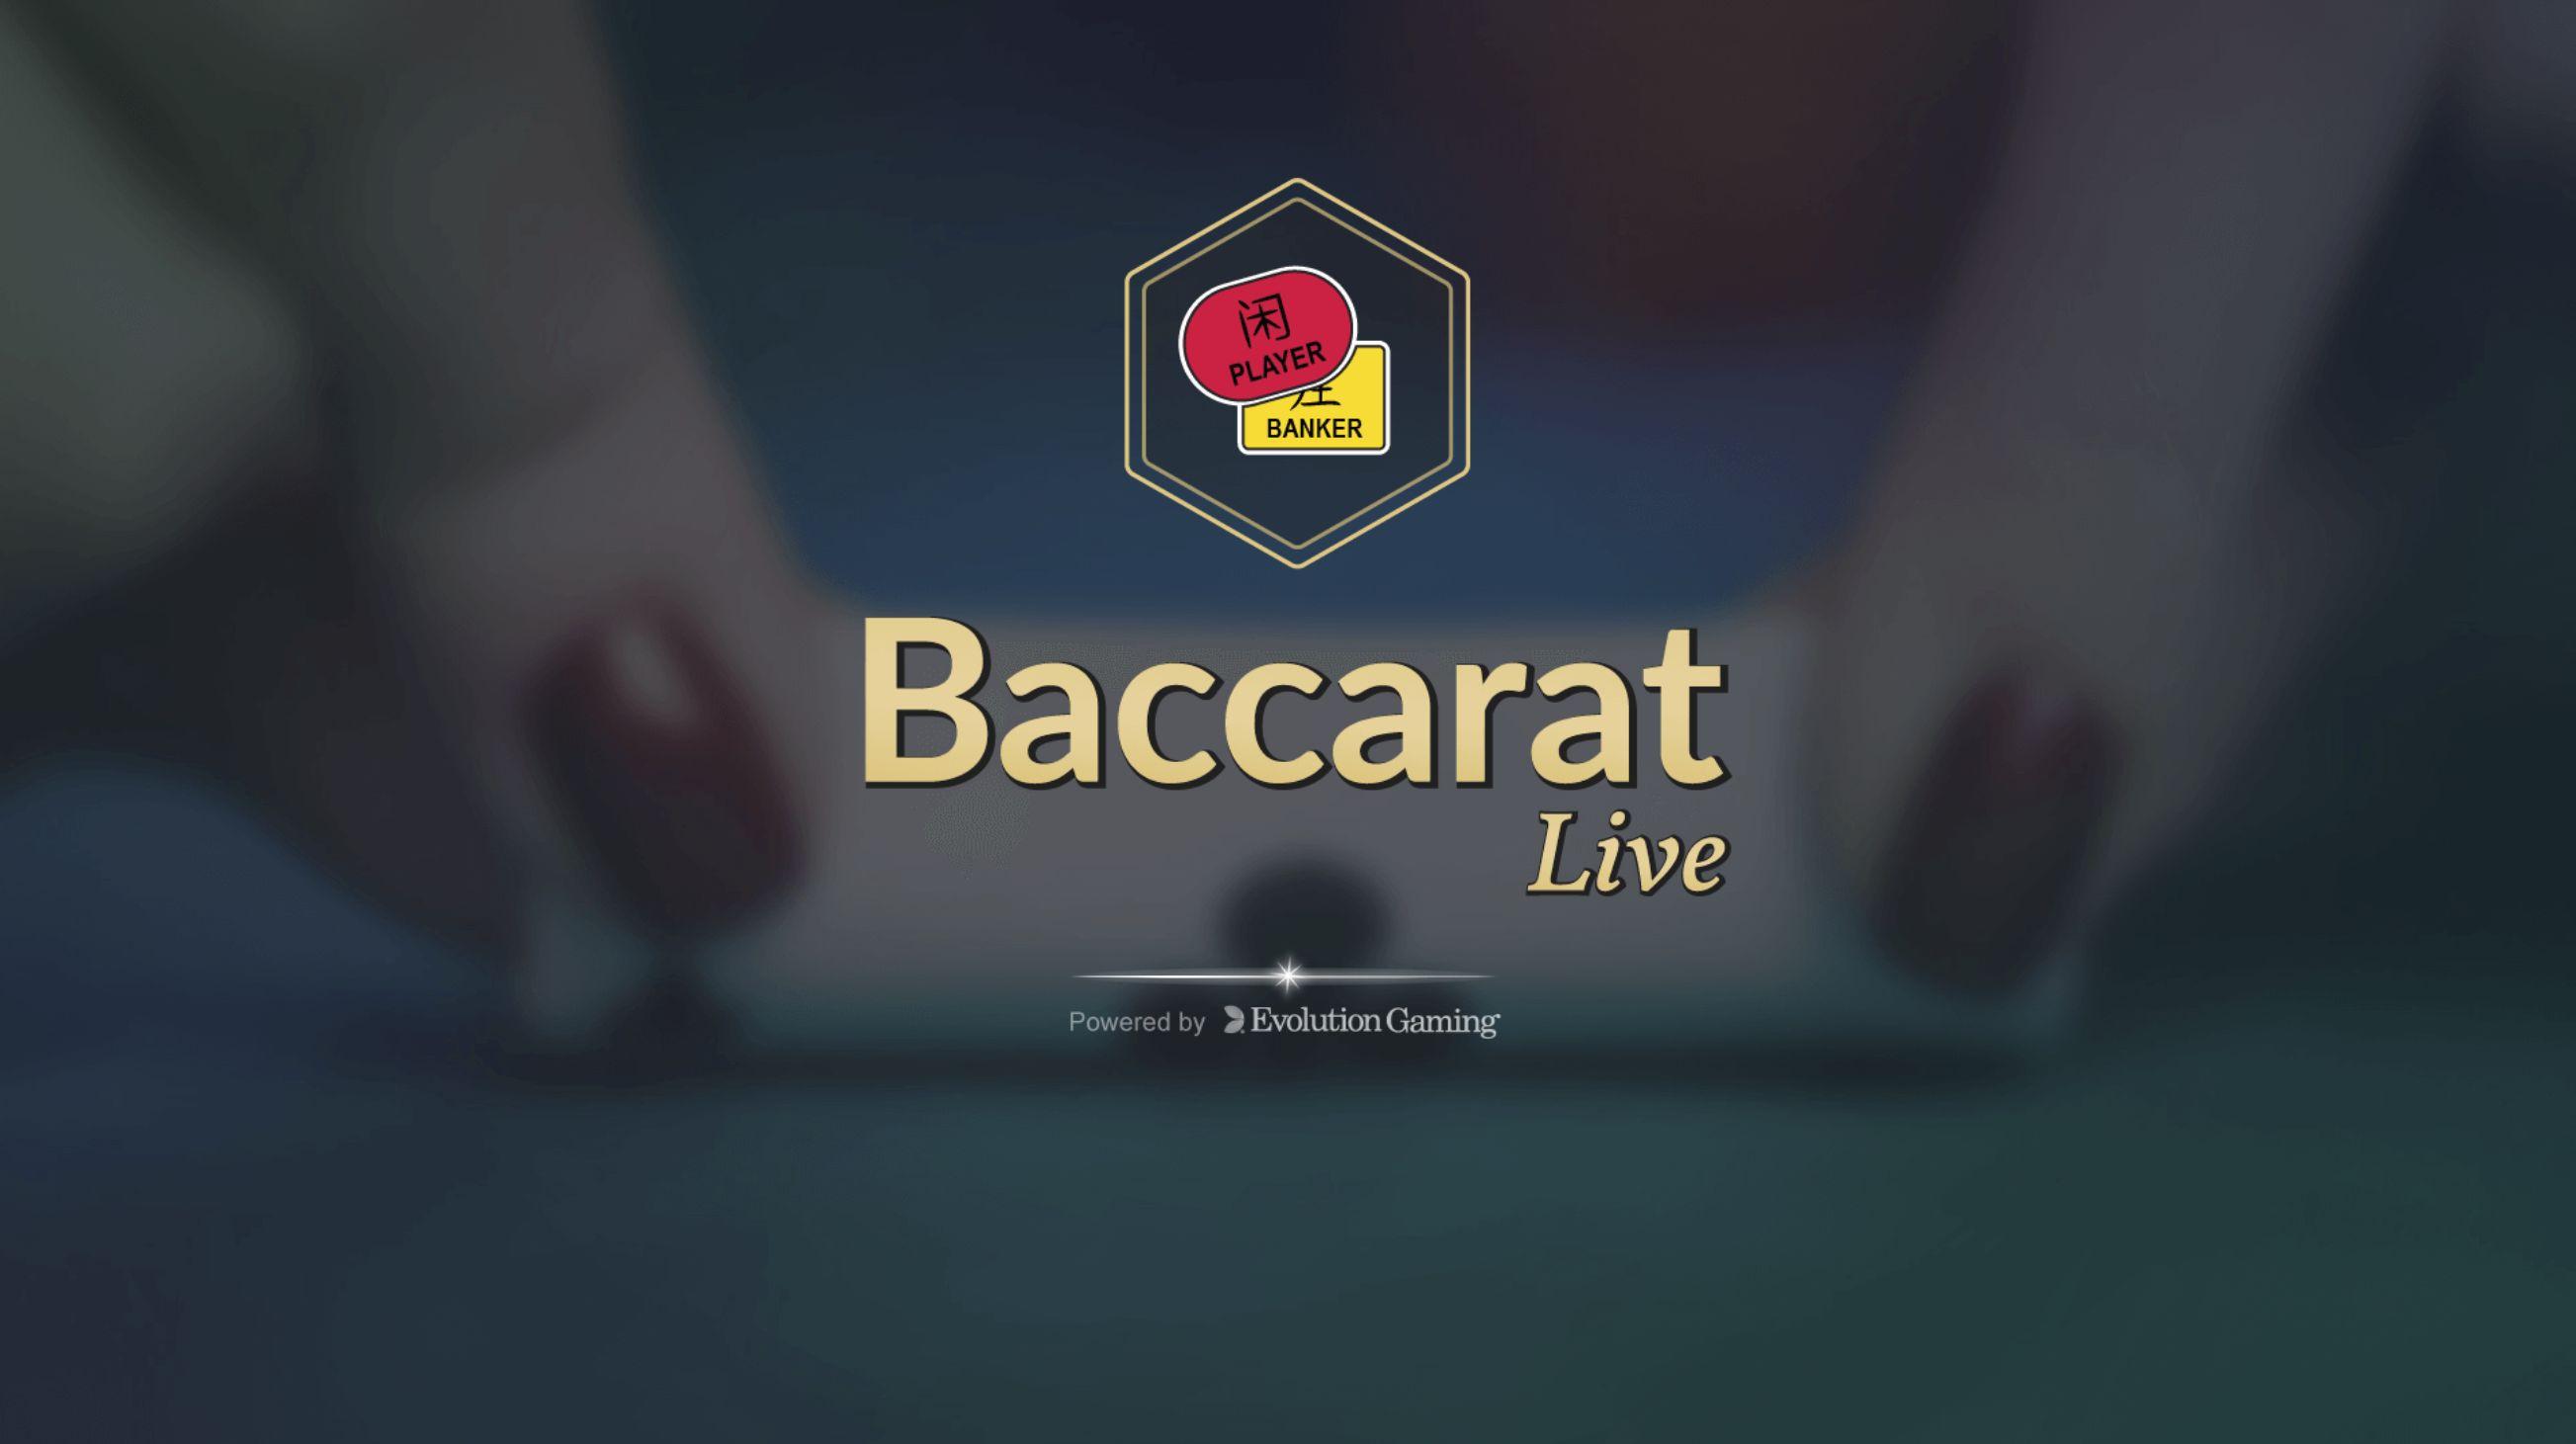 Live-online_baccarat peli_nettirahapelit_parhaat kasinopelit_soumen parhaat kasinot